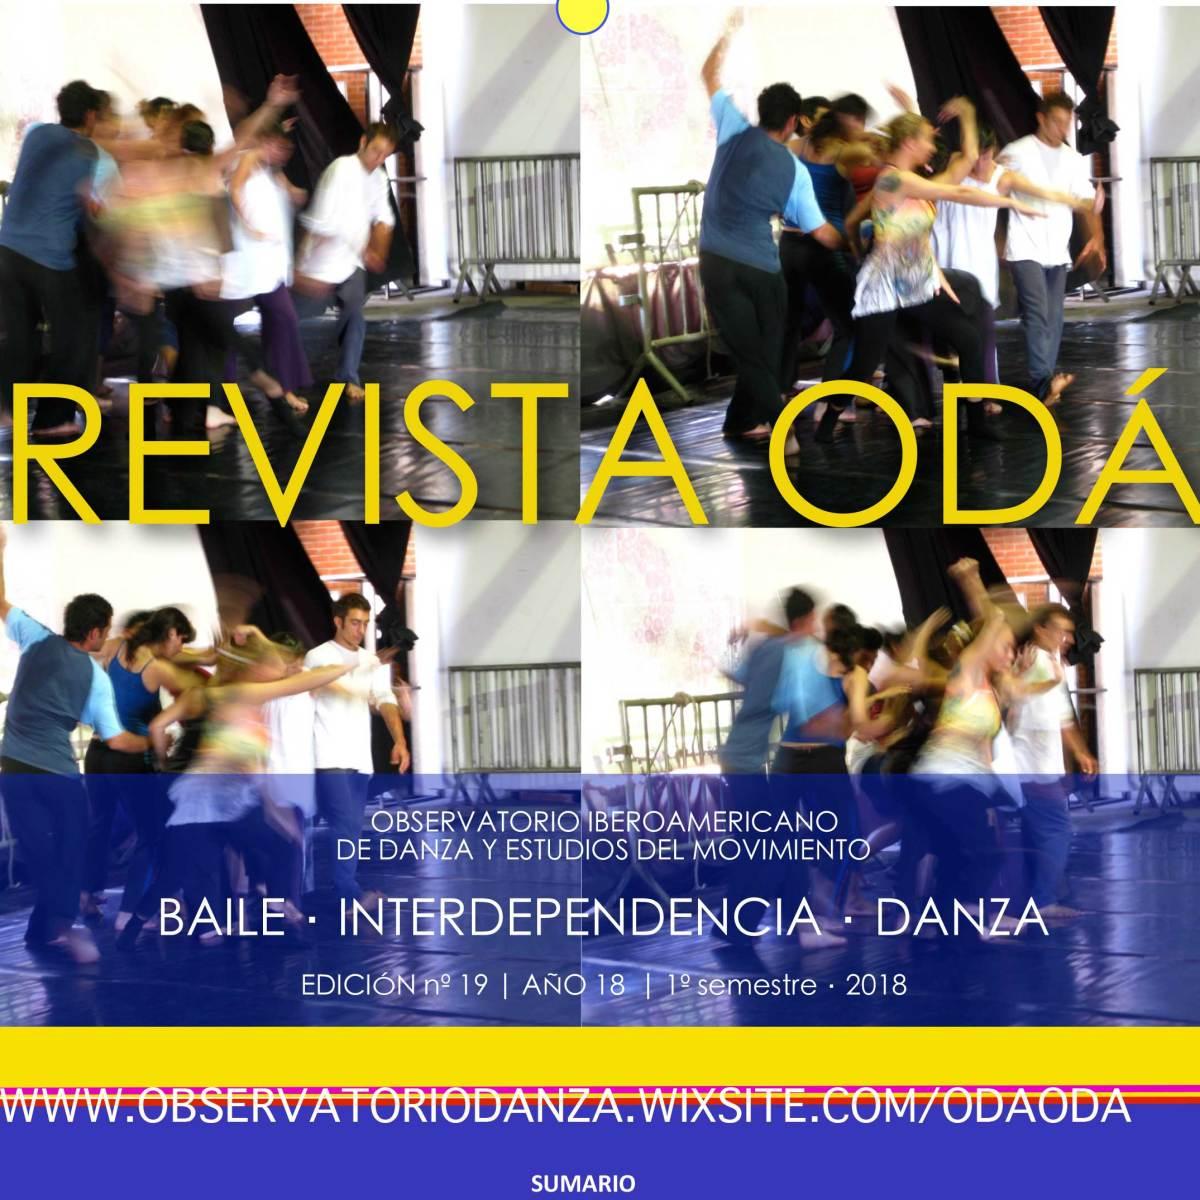 Revista ODÁ– Observatorio Danza